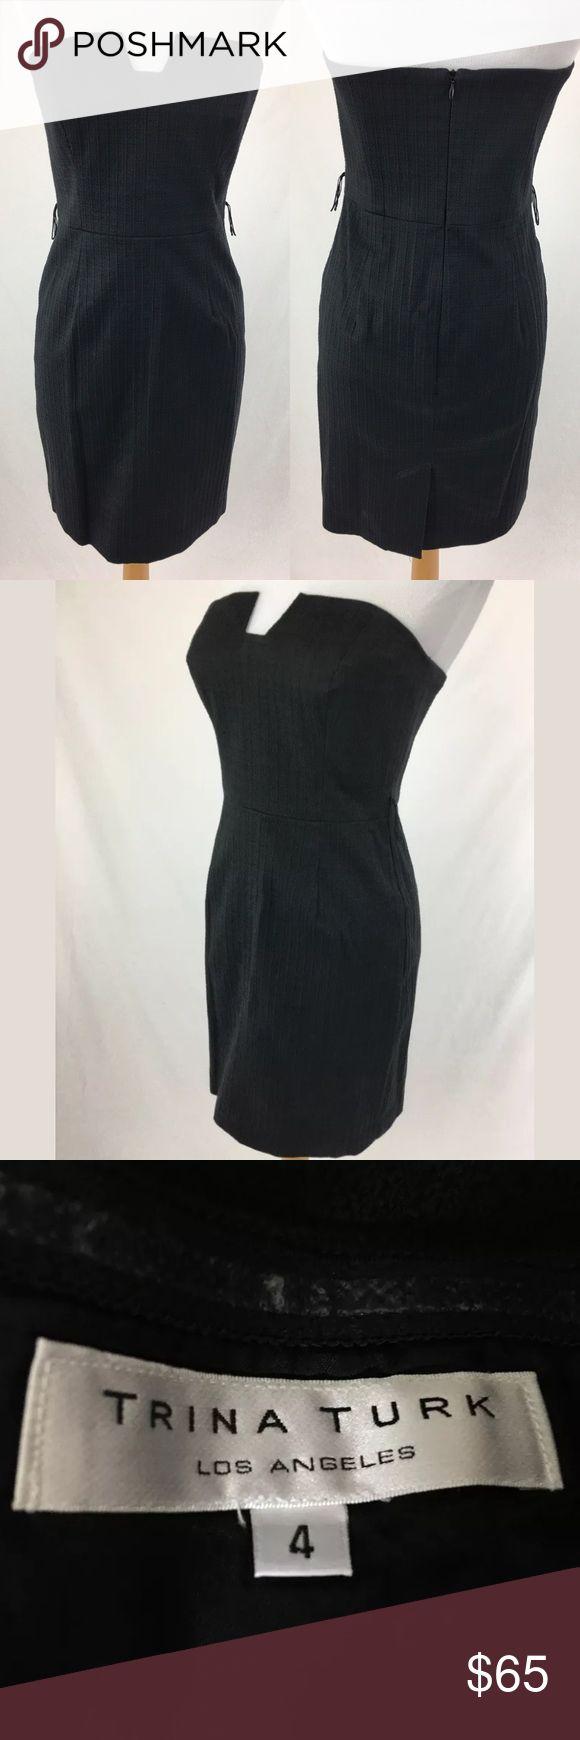 Trina Turk dress SKU: SD15815  Bust: 31 Waist: 28 Fabric Content: 97% Cotton, 3% elastane Length Bust to Hem: 28.75 Hip: 36 It has belt loops, but a belt is not included. Trina Turk Dresses